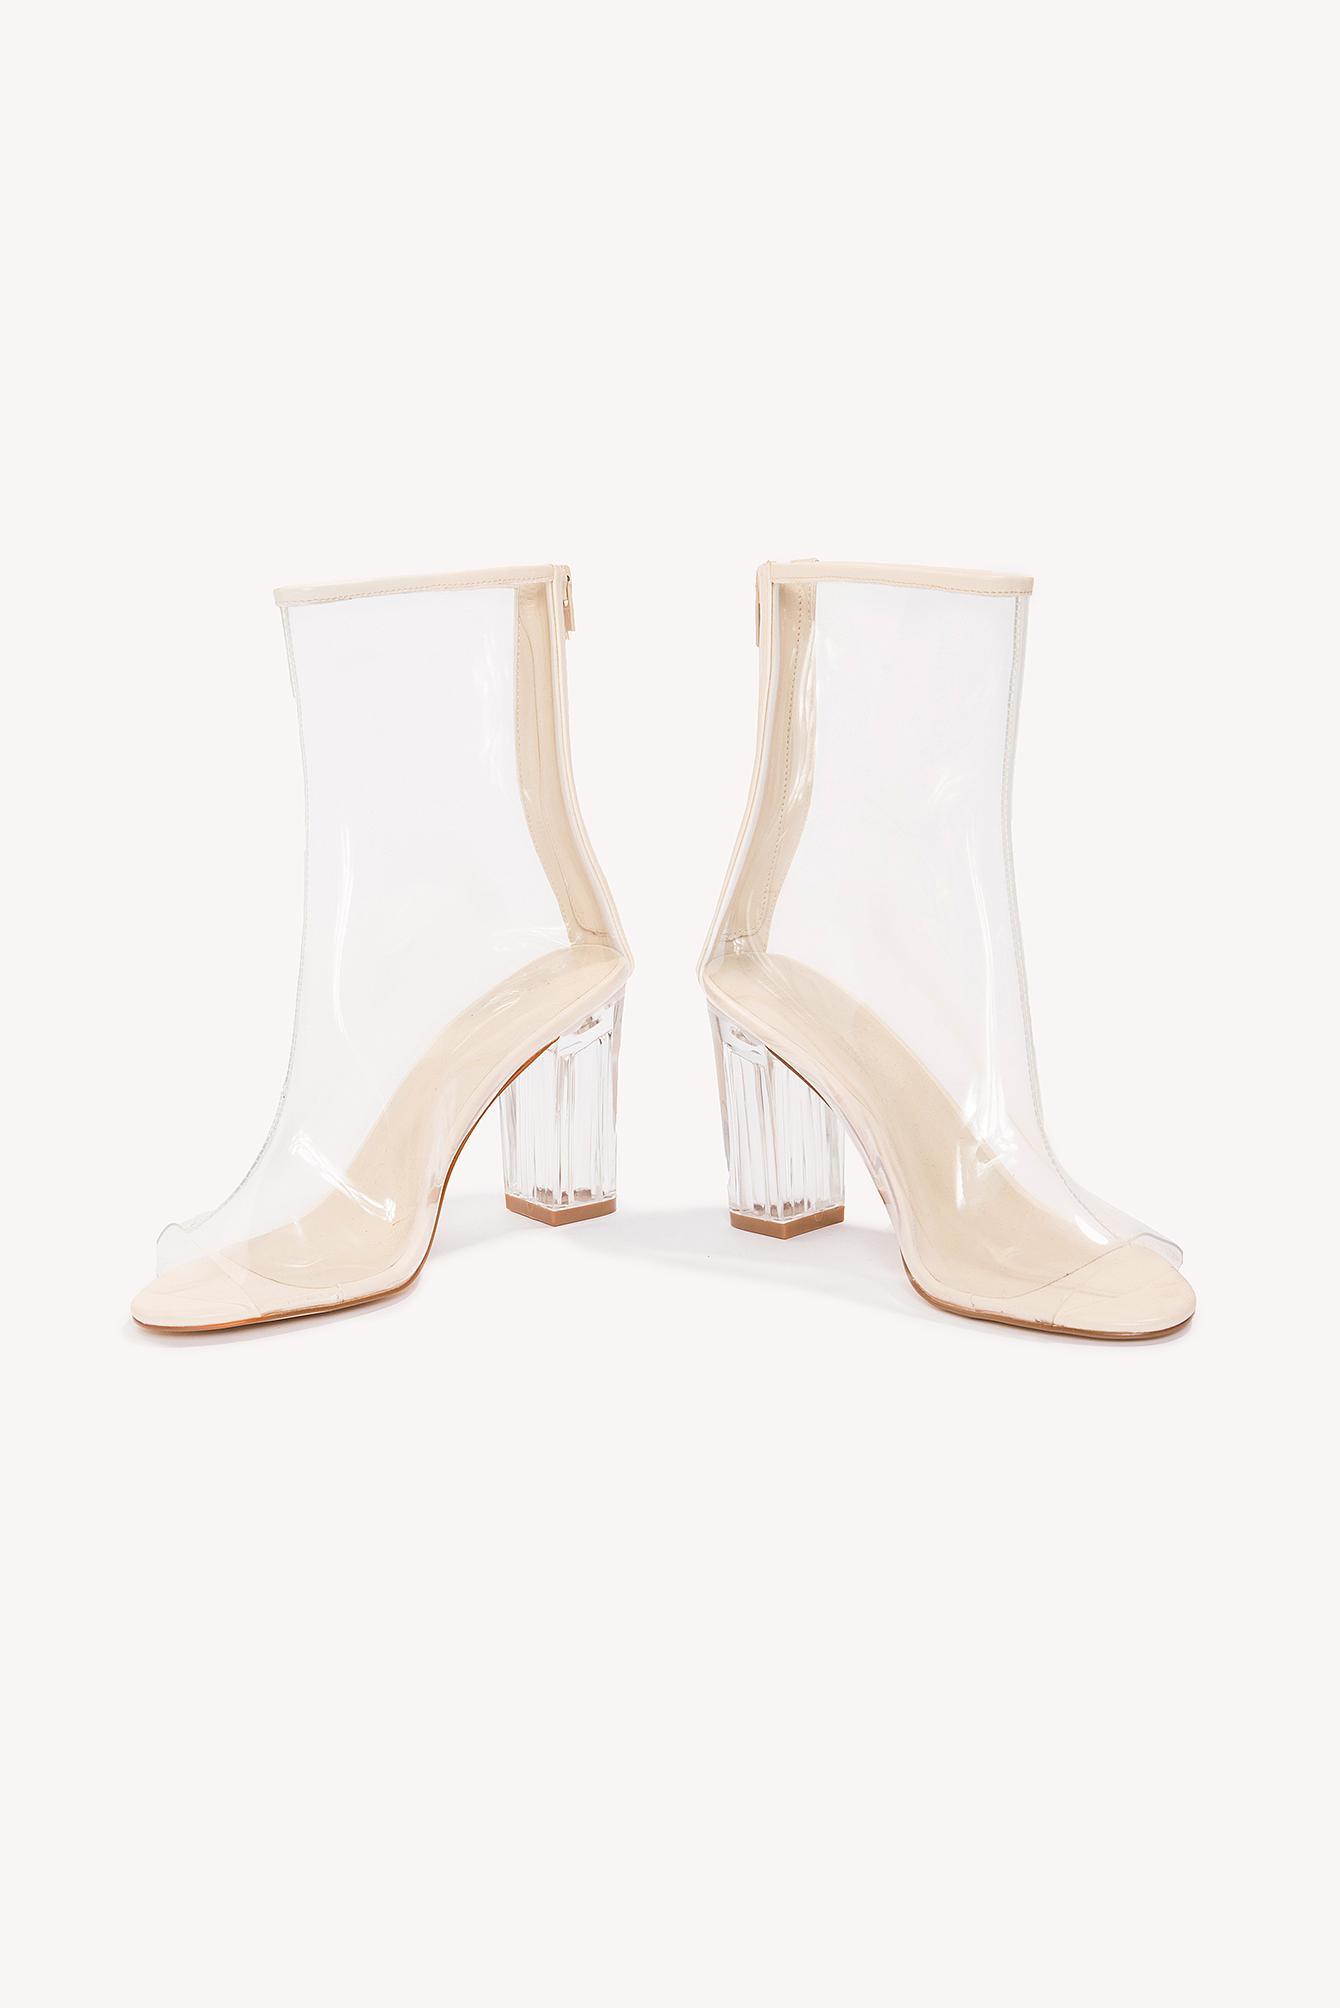 1a868eefc60 Lyst - NA-KD Transparent Mid Heel Boots